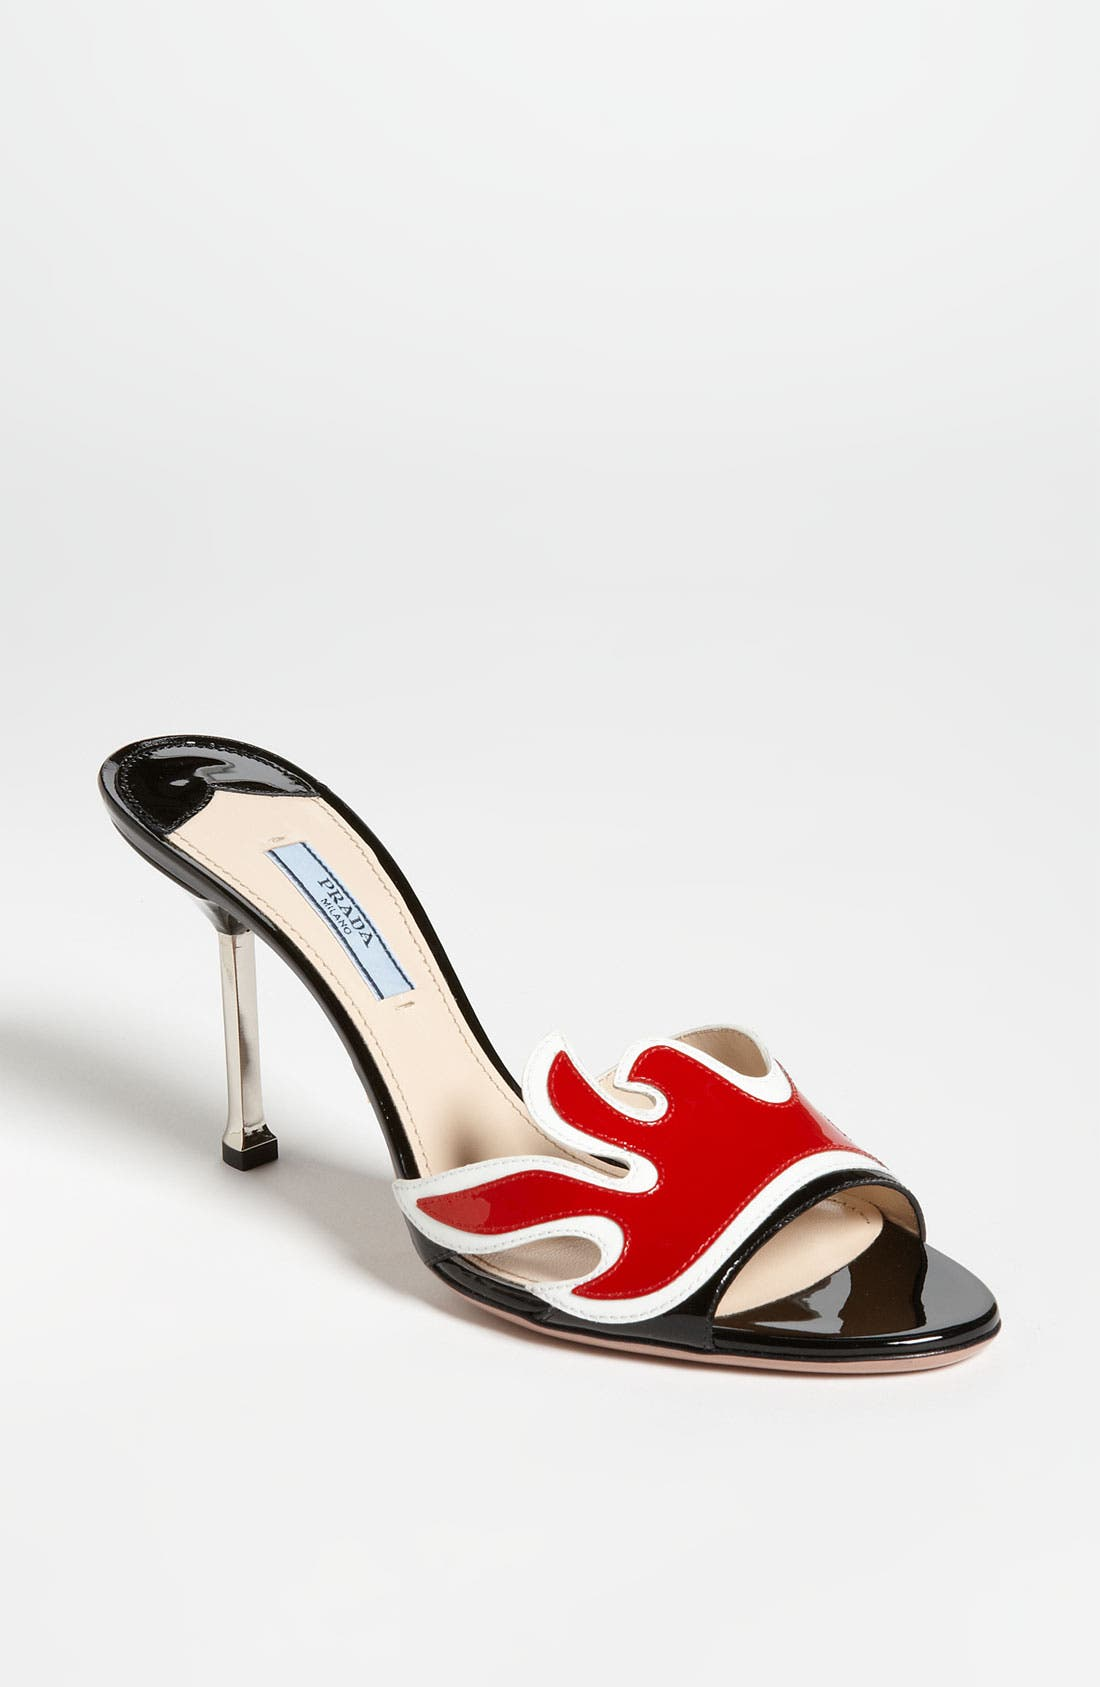 Alternate Image 1 Selected - Prada Flame Slide Sandal